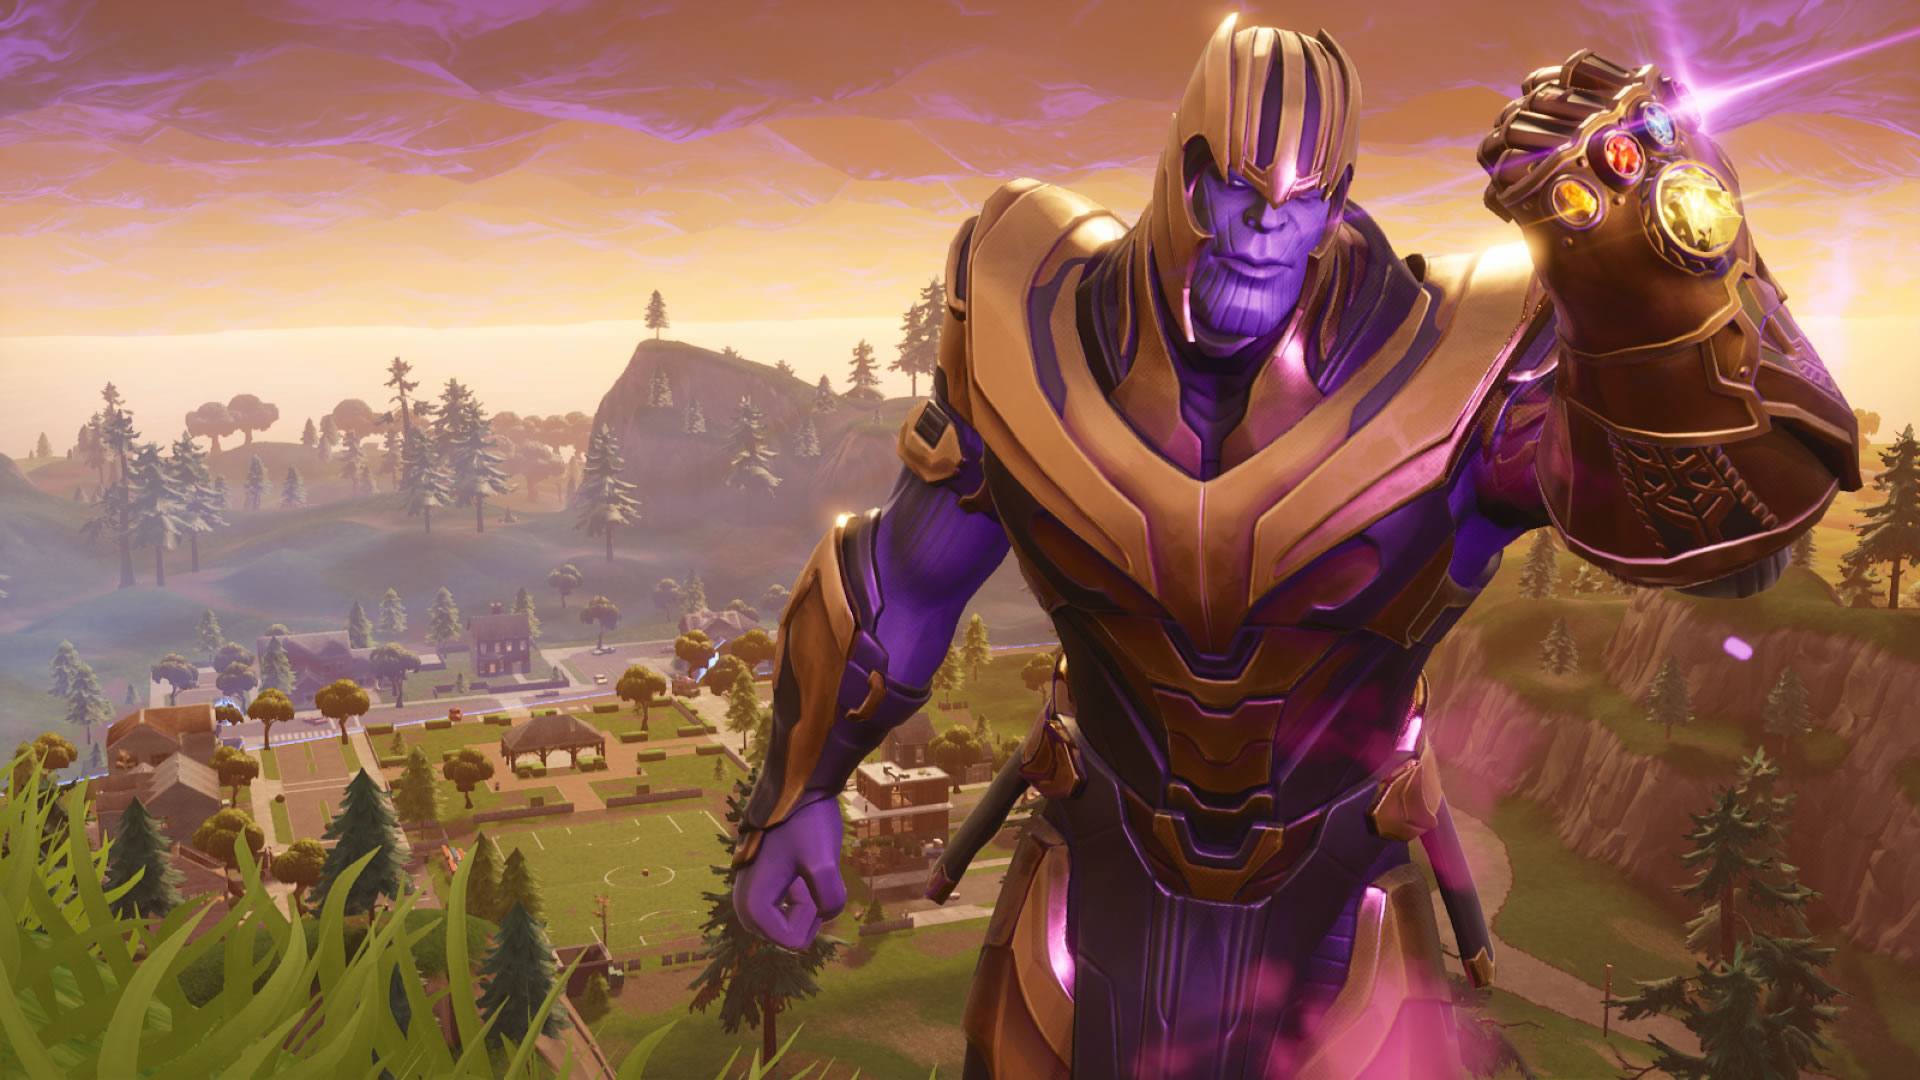 download wallpaper: Fortnite Thanos skin wallpaper